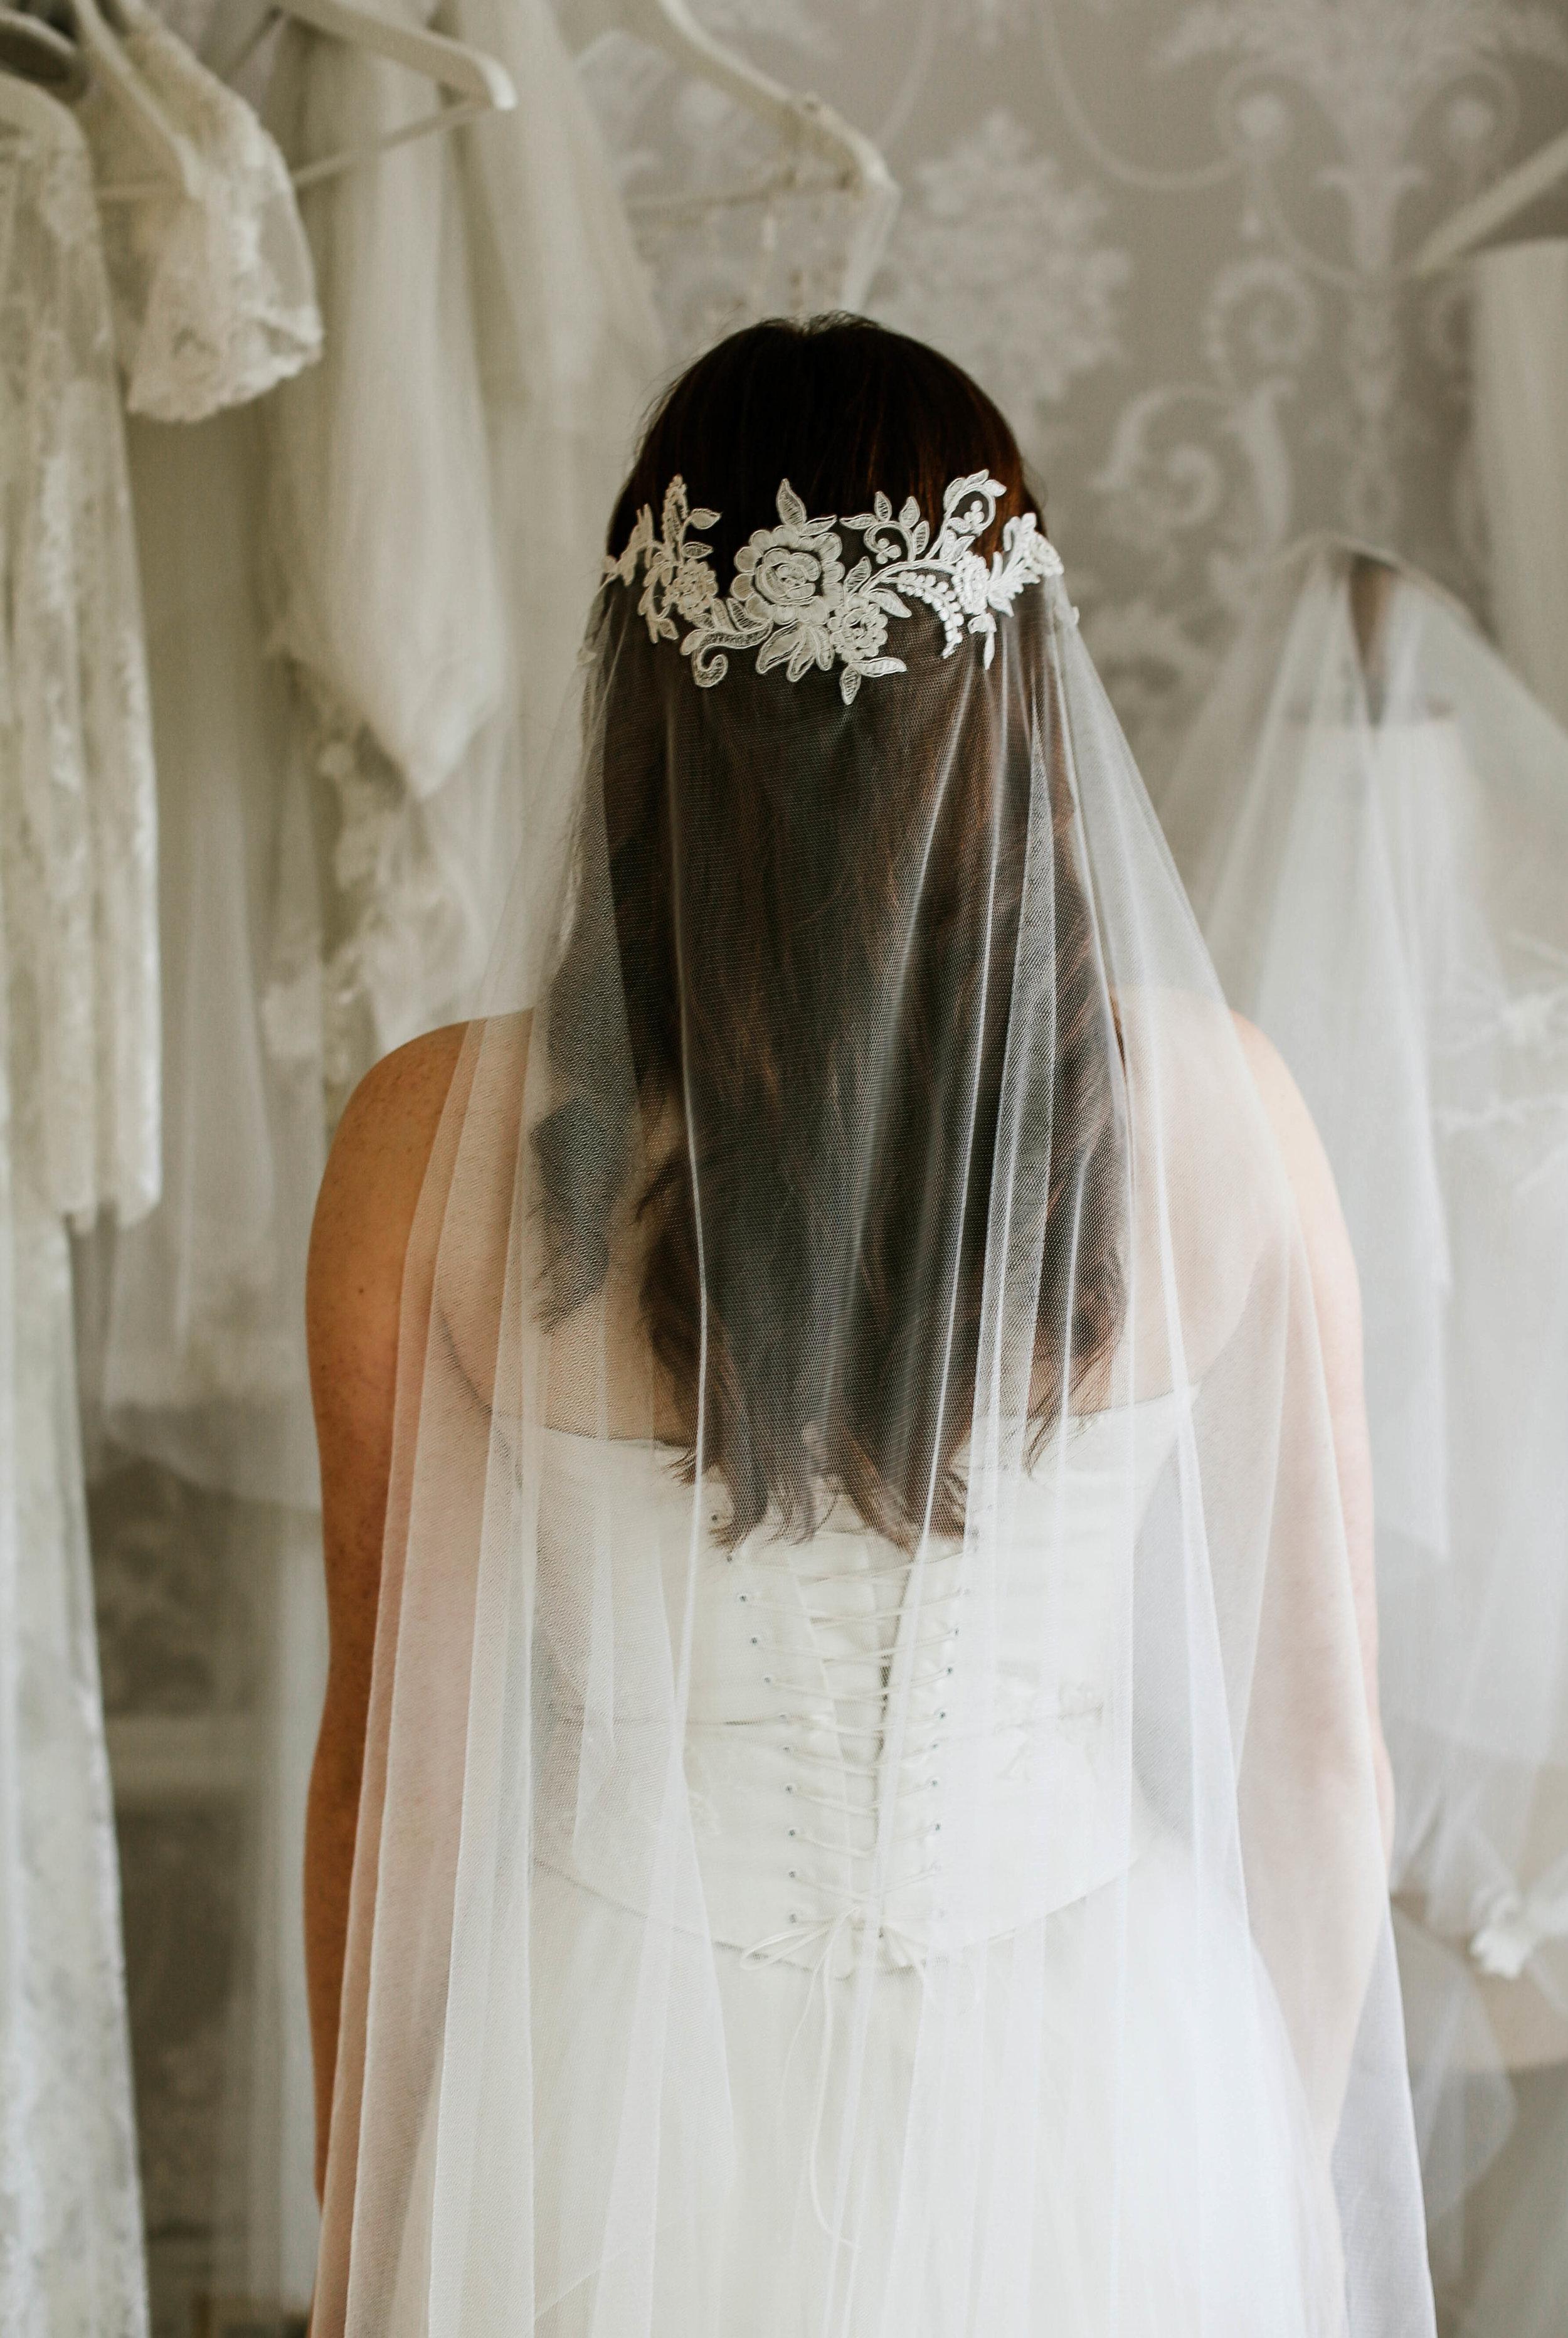 Lace wedding veil, juliet cap bridal veil, hand made in Truro, Cornwall